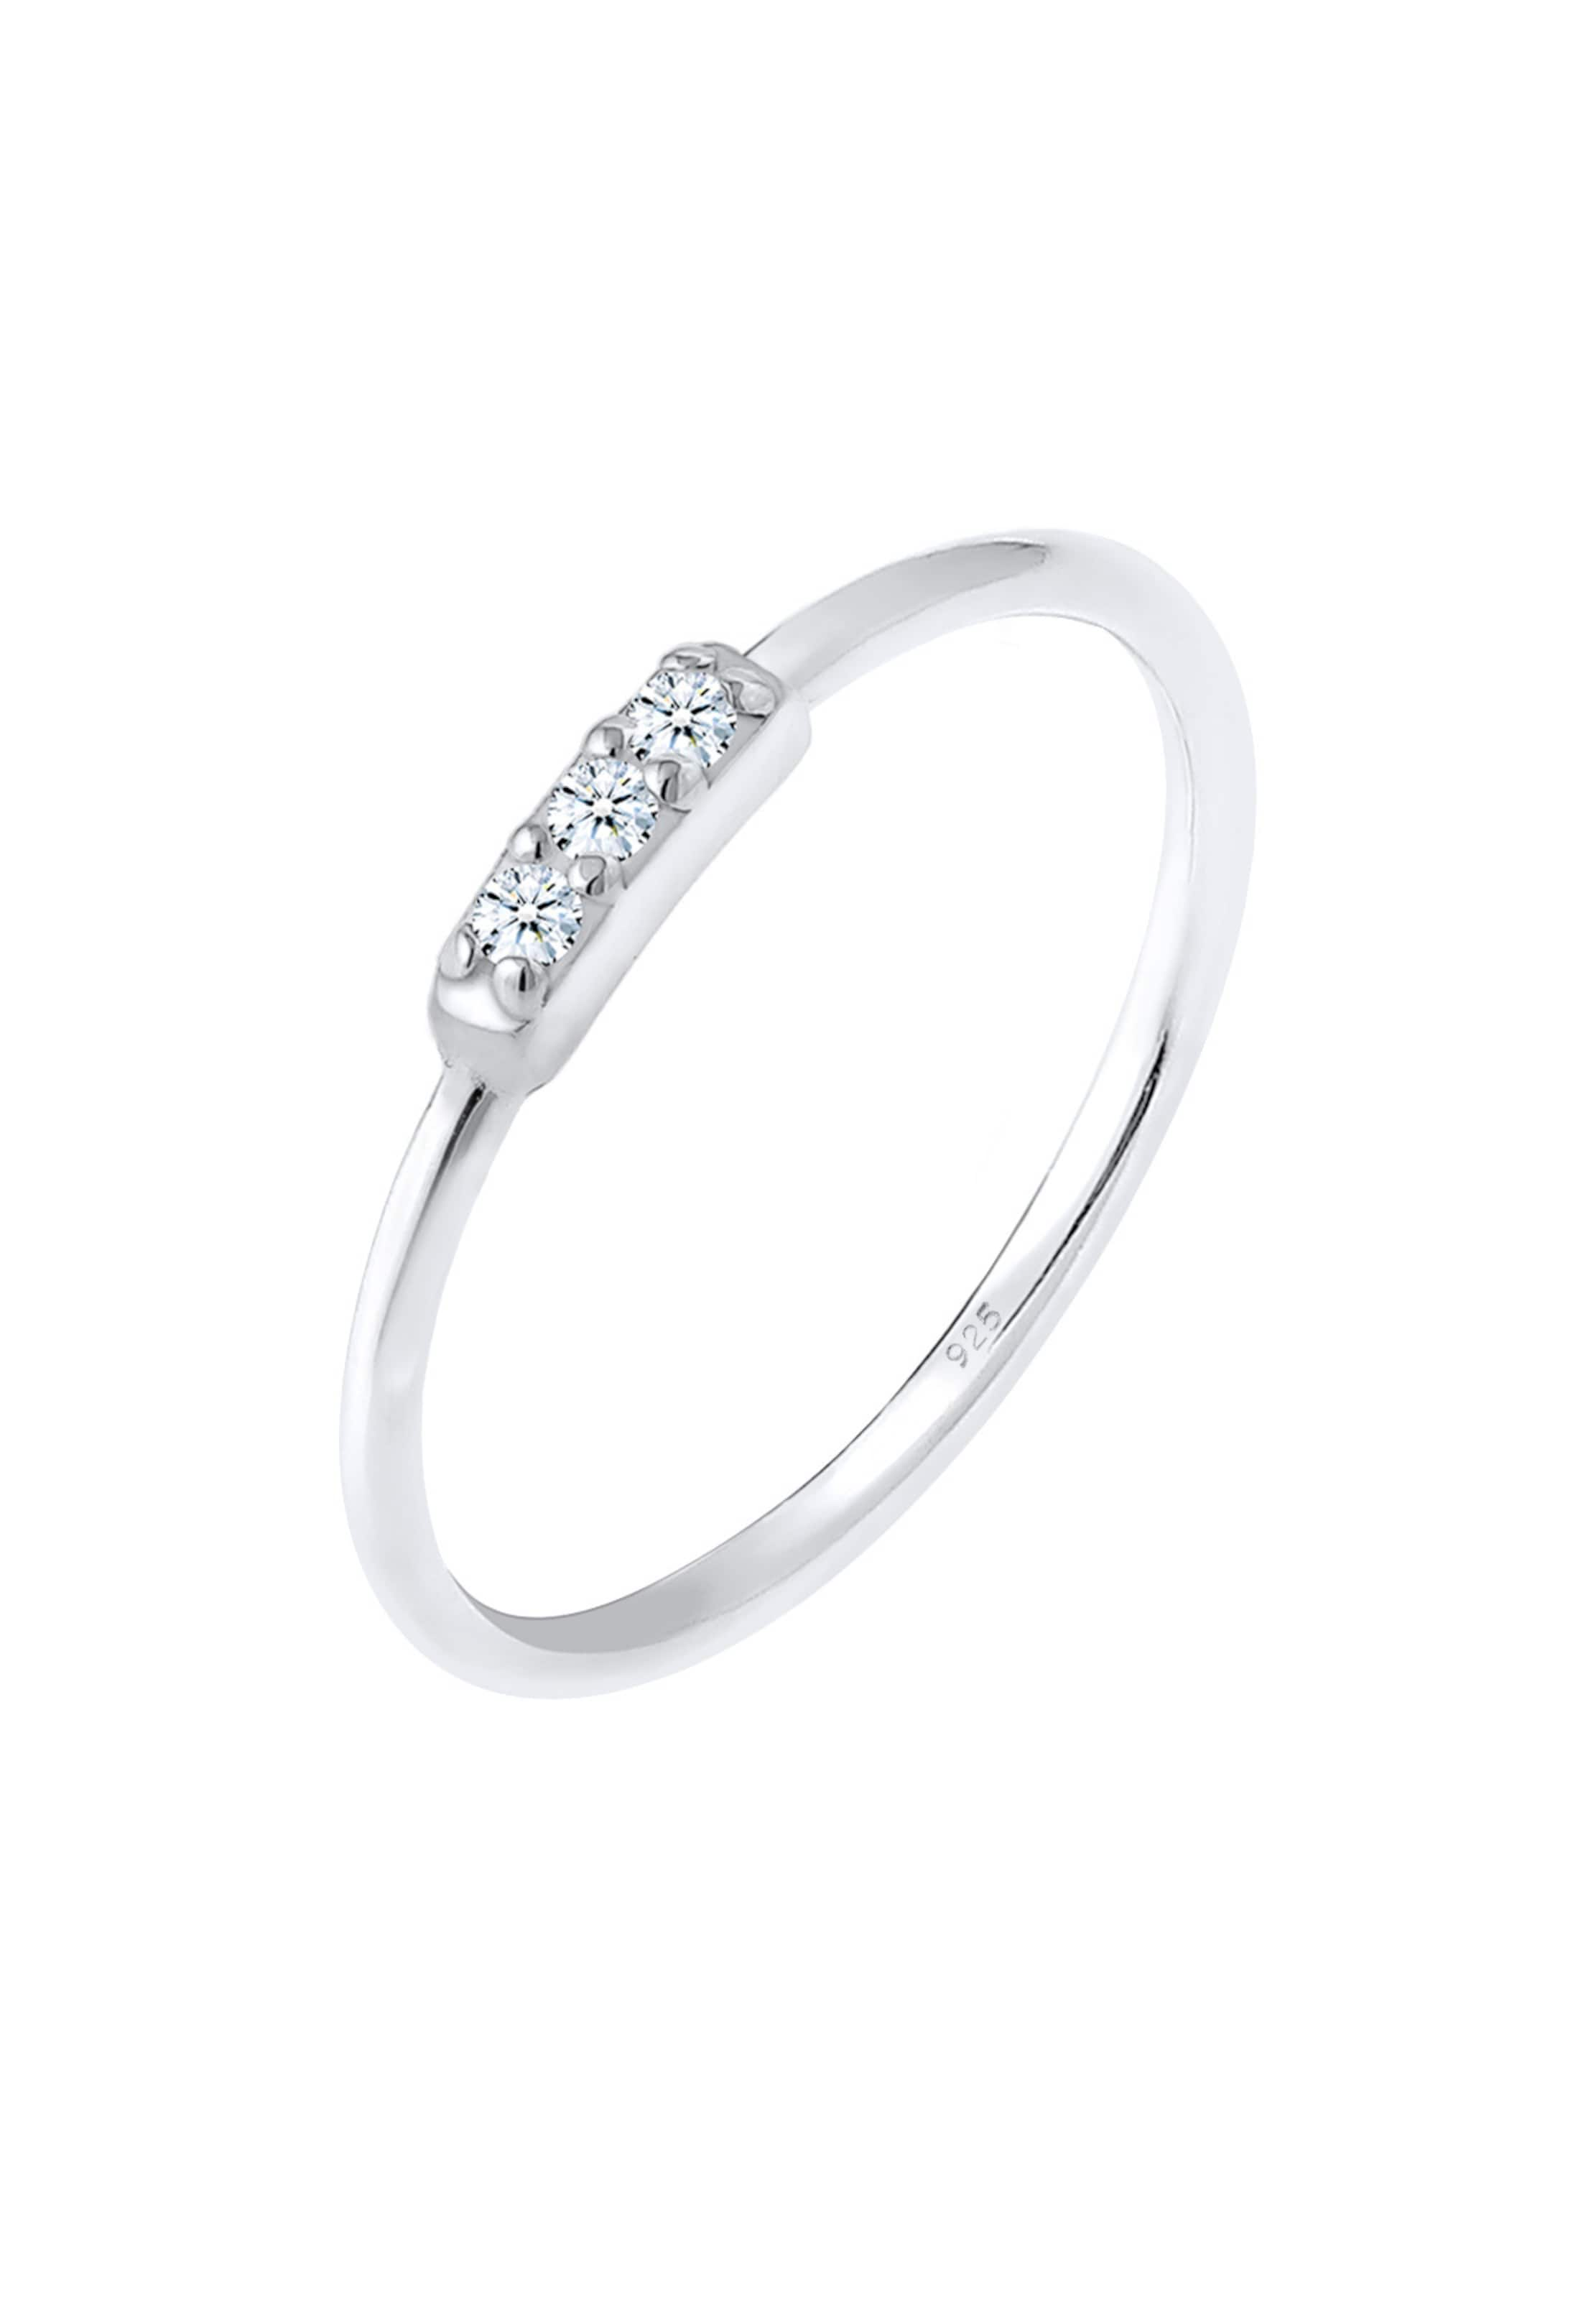 Ring Diamore Ring Silber Silber Ring In Diamore Diamore In OXw8Pkn0